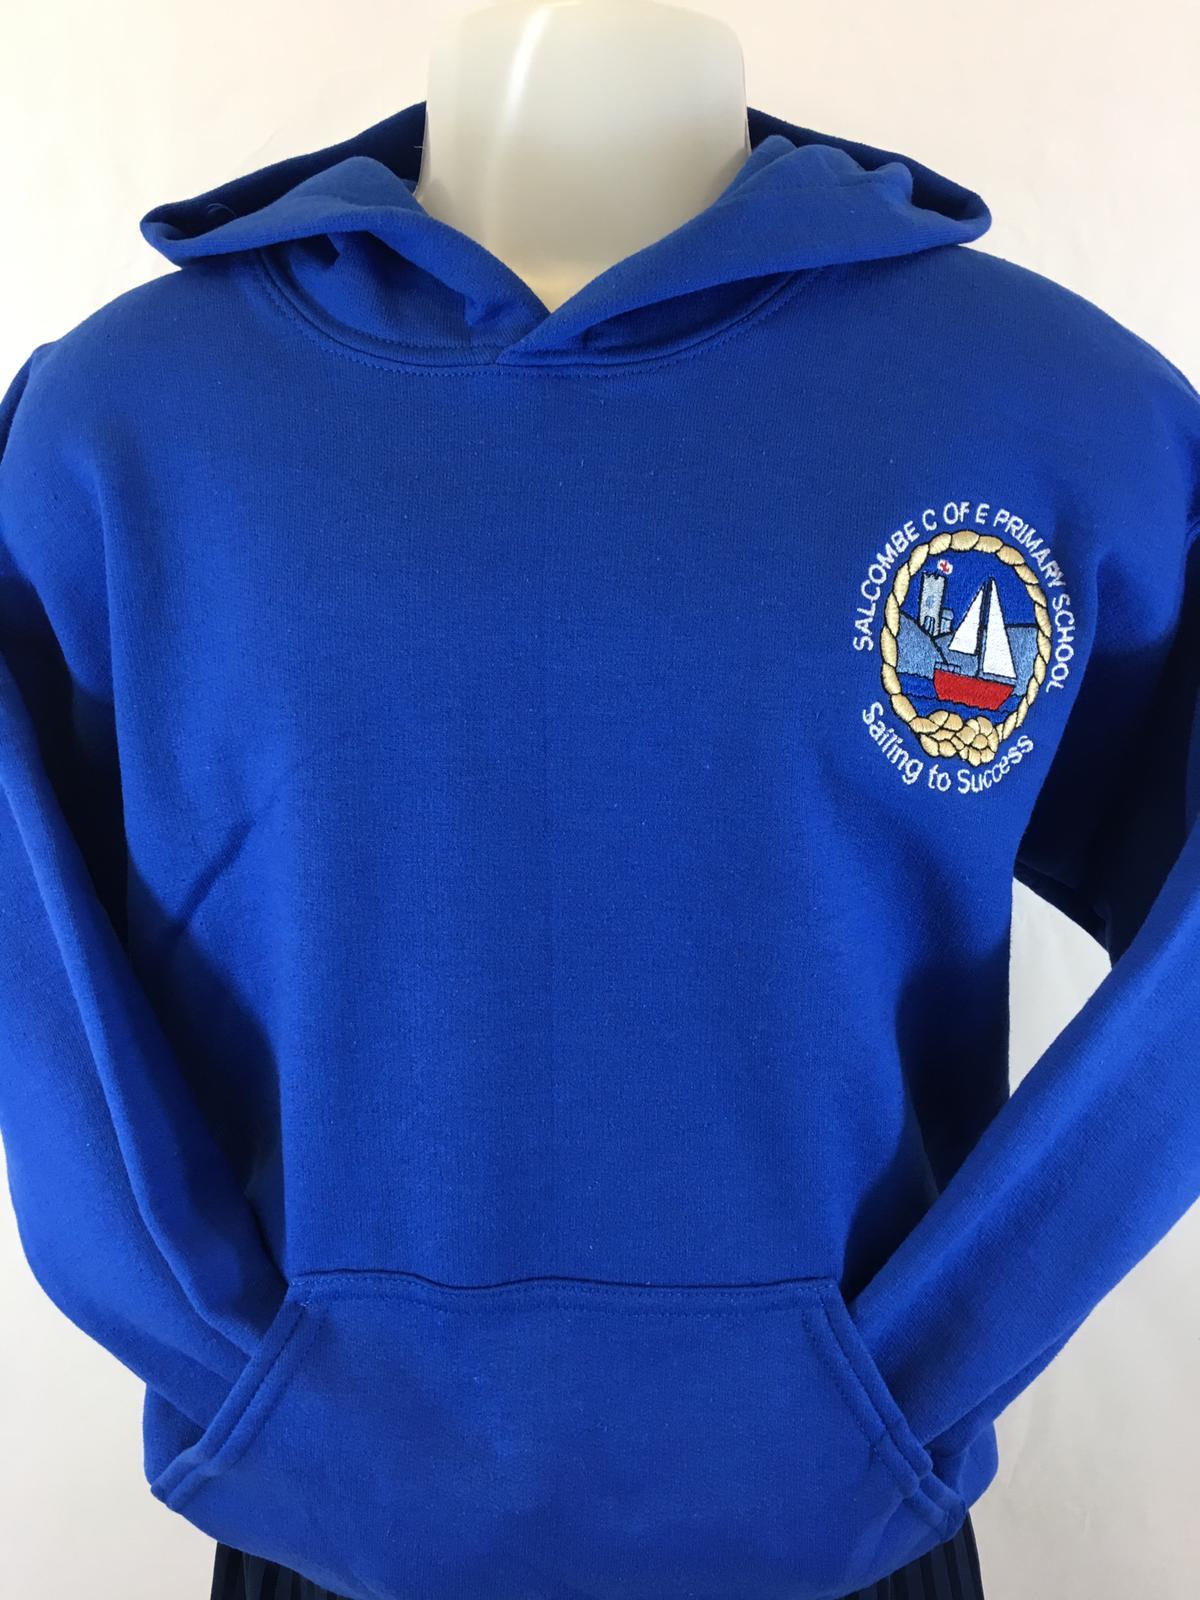 Salcombe Primary School PE Hooded Sweatshirt